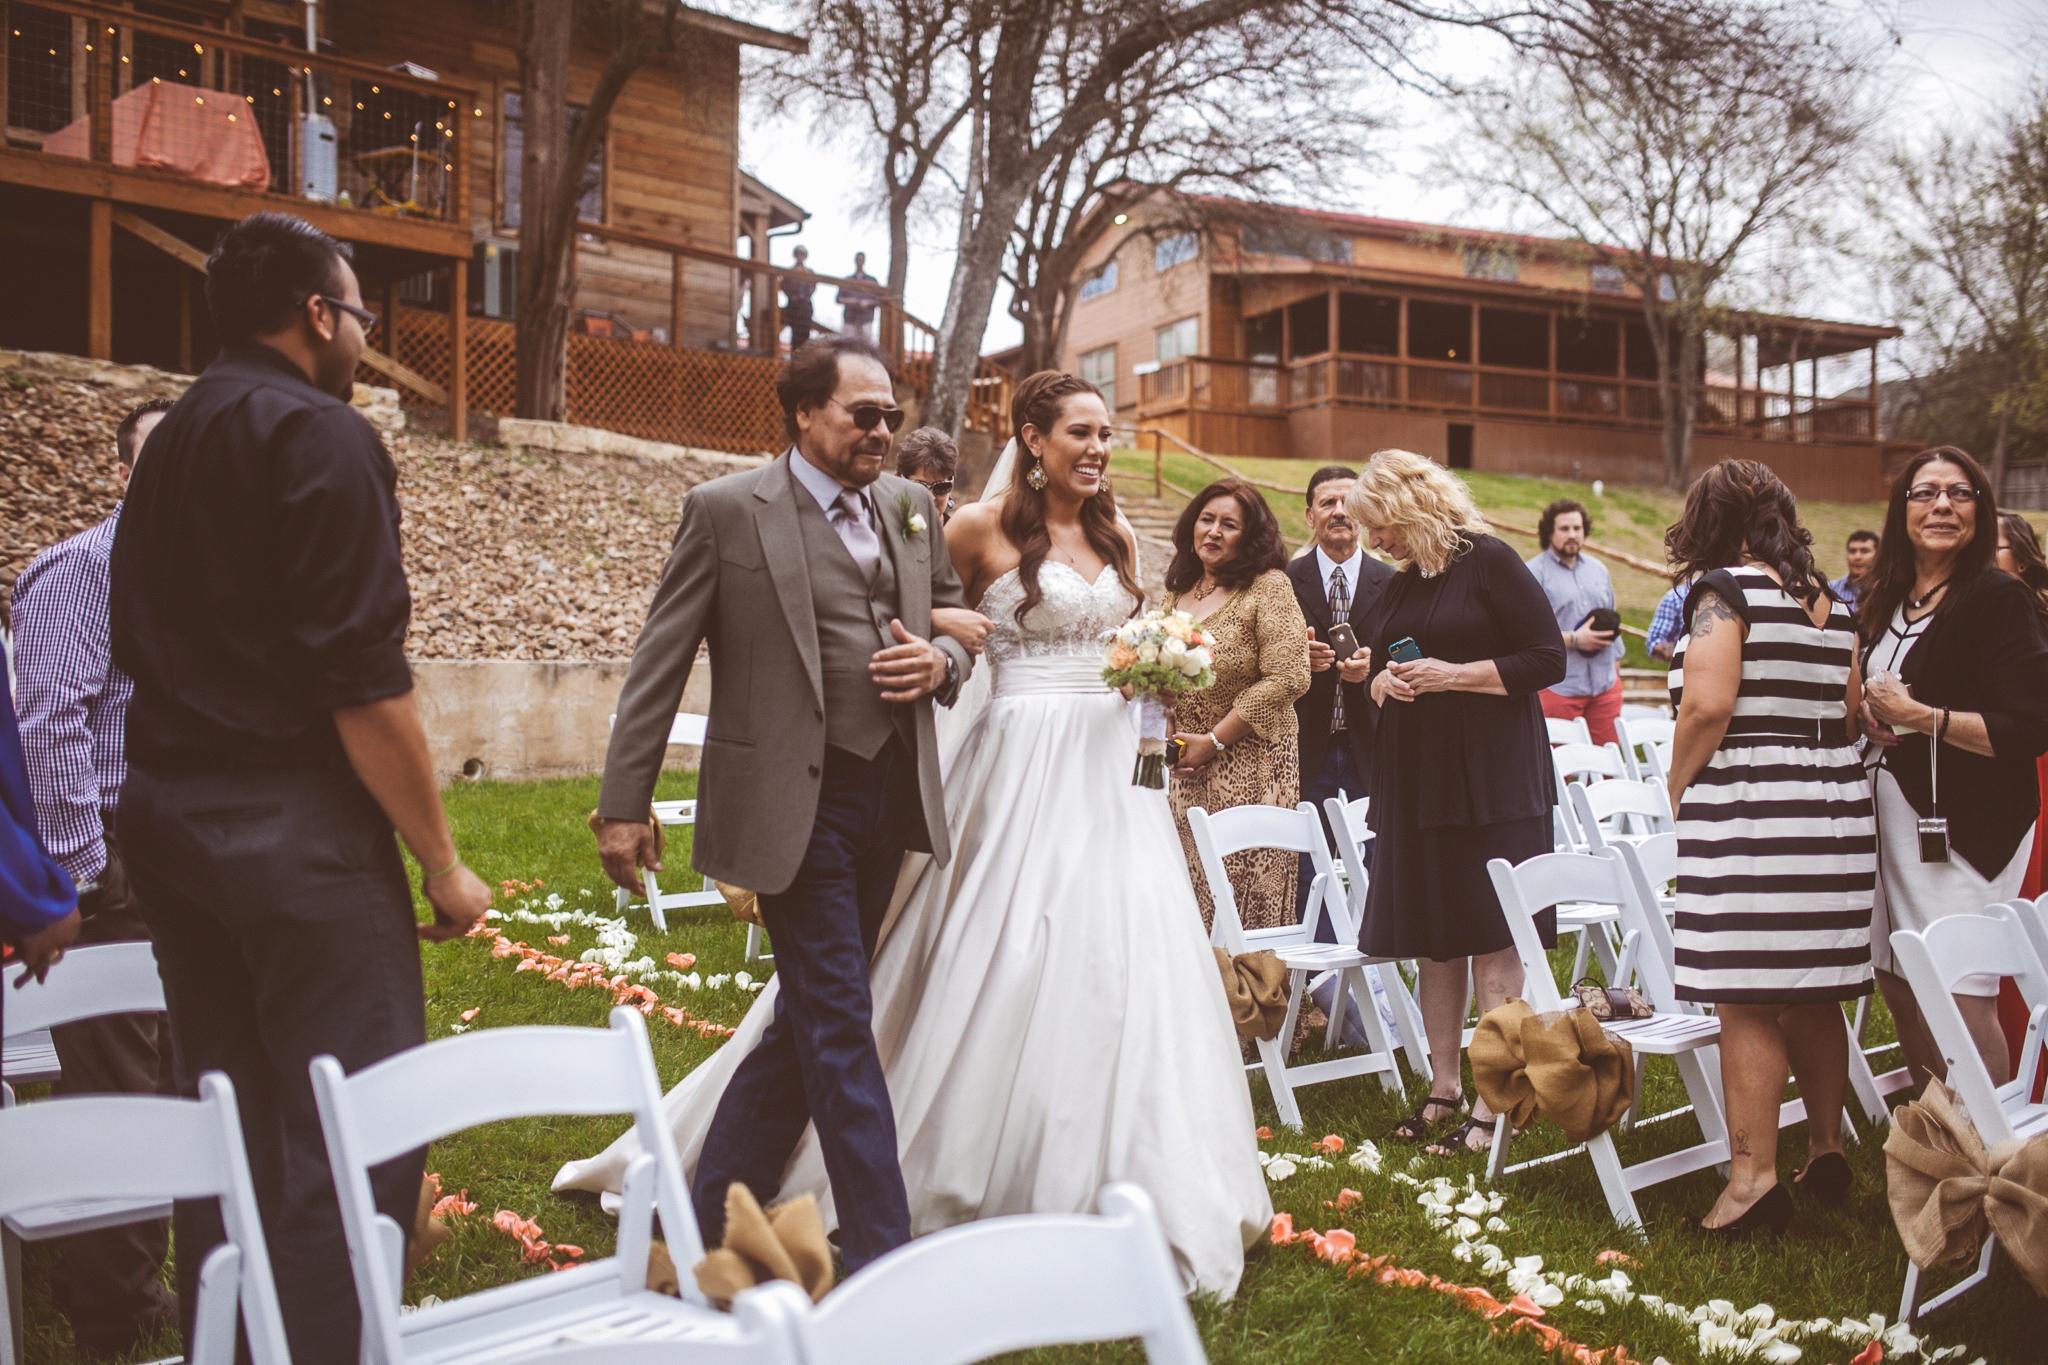 Milltown-Historic-Distric-Wedding-New-Braunfels-010.jpg